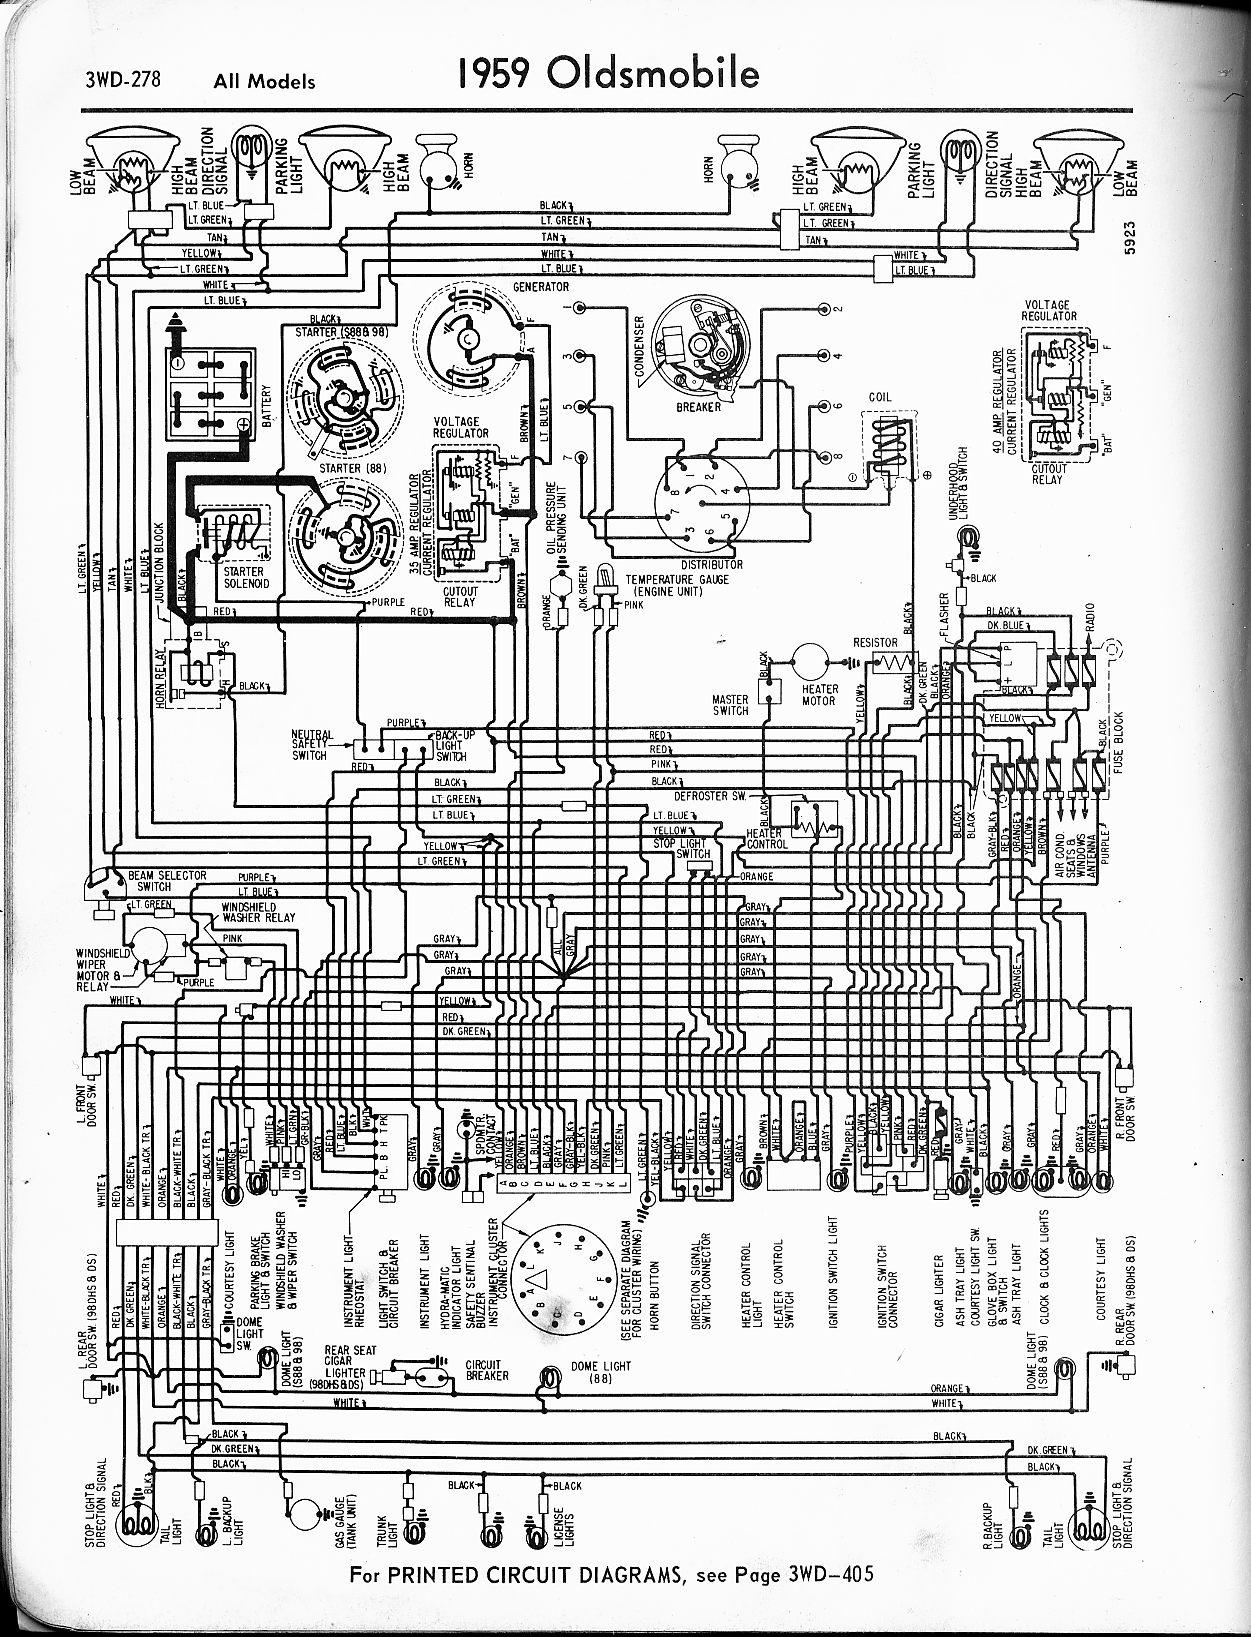 2003 toyota sienna fuse diagram